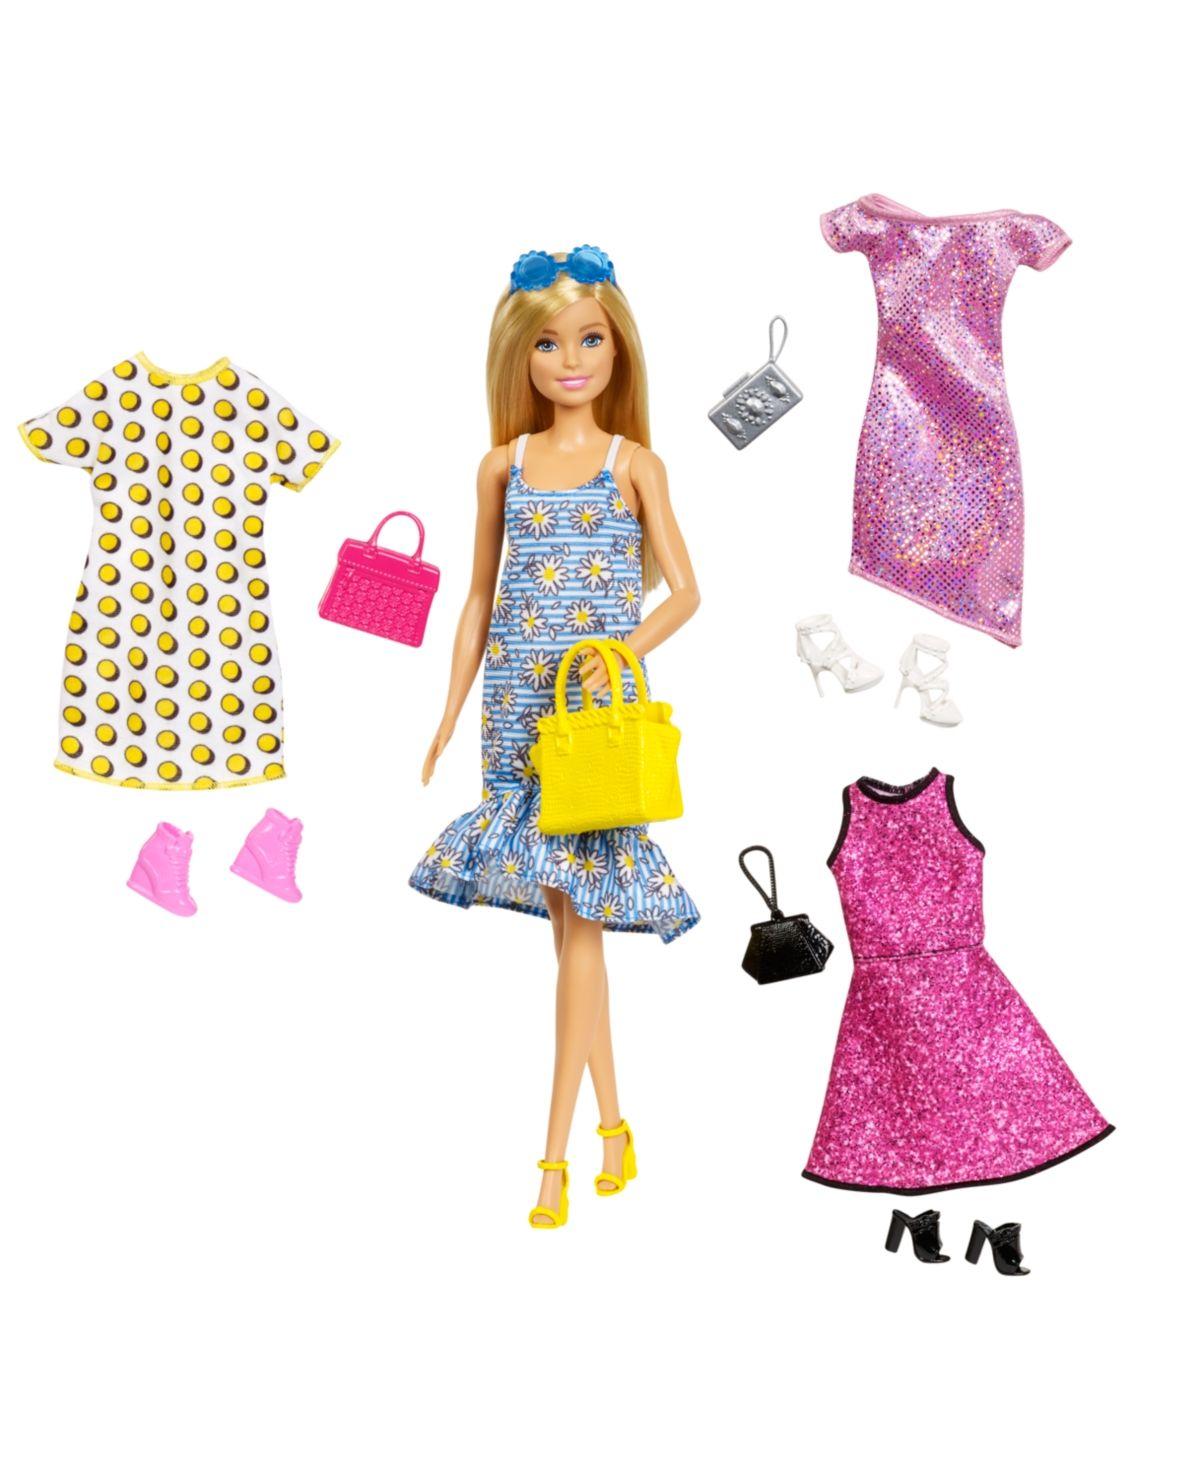 Barbie Doll Fashions Accessories Barbie Clothes Doll Clothes Barbie Dress